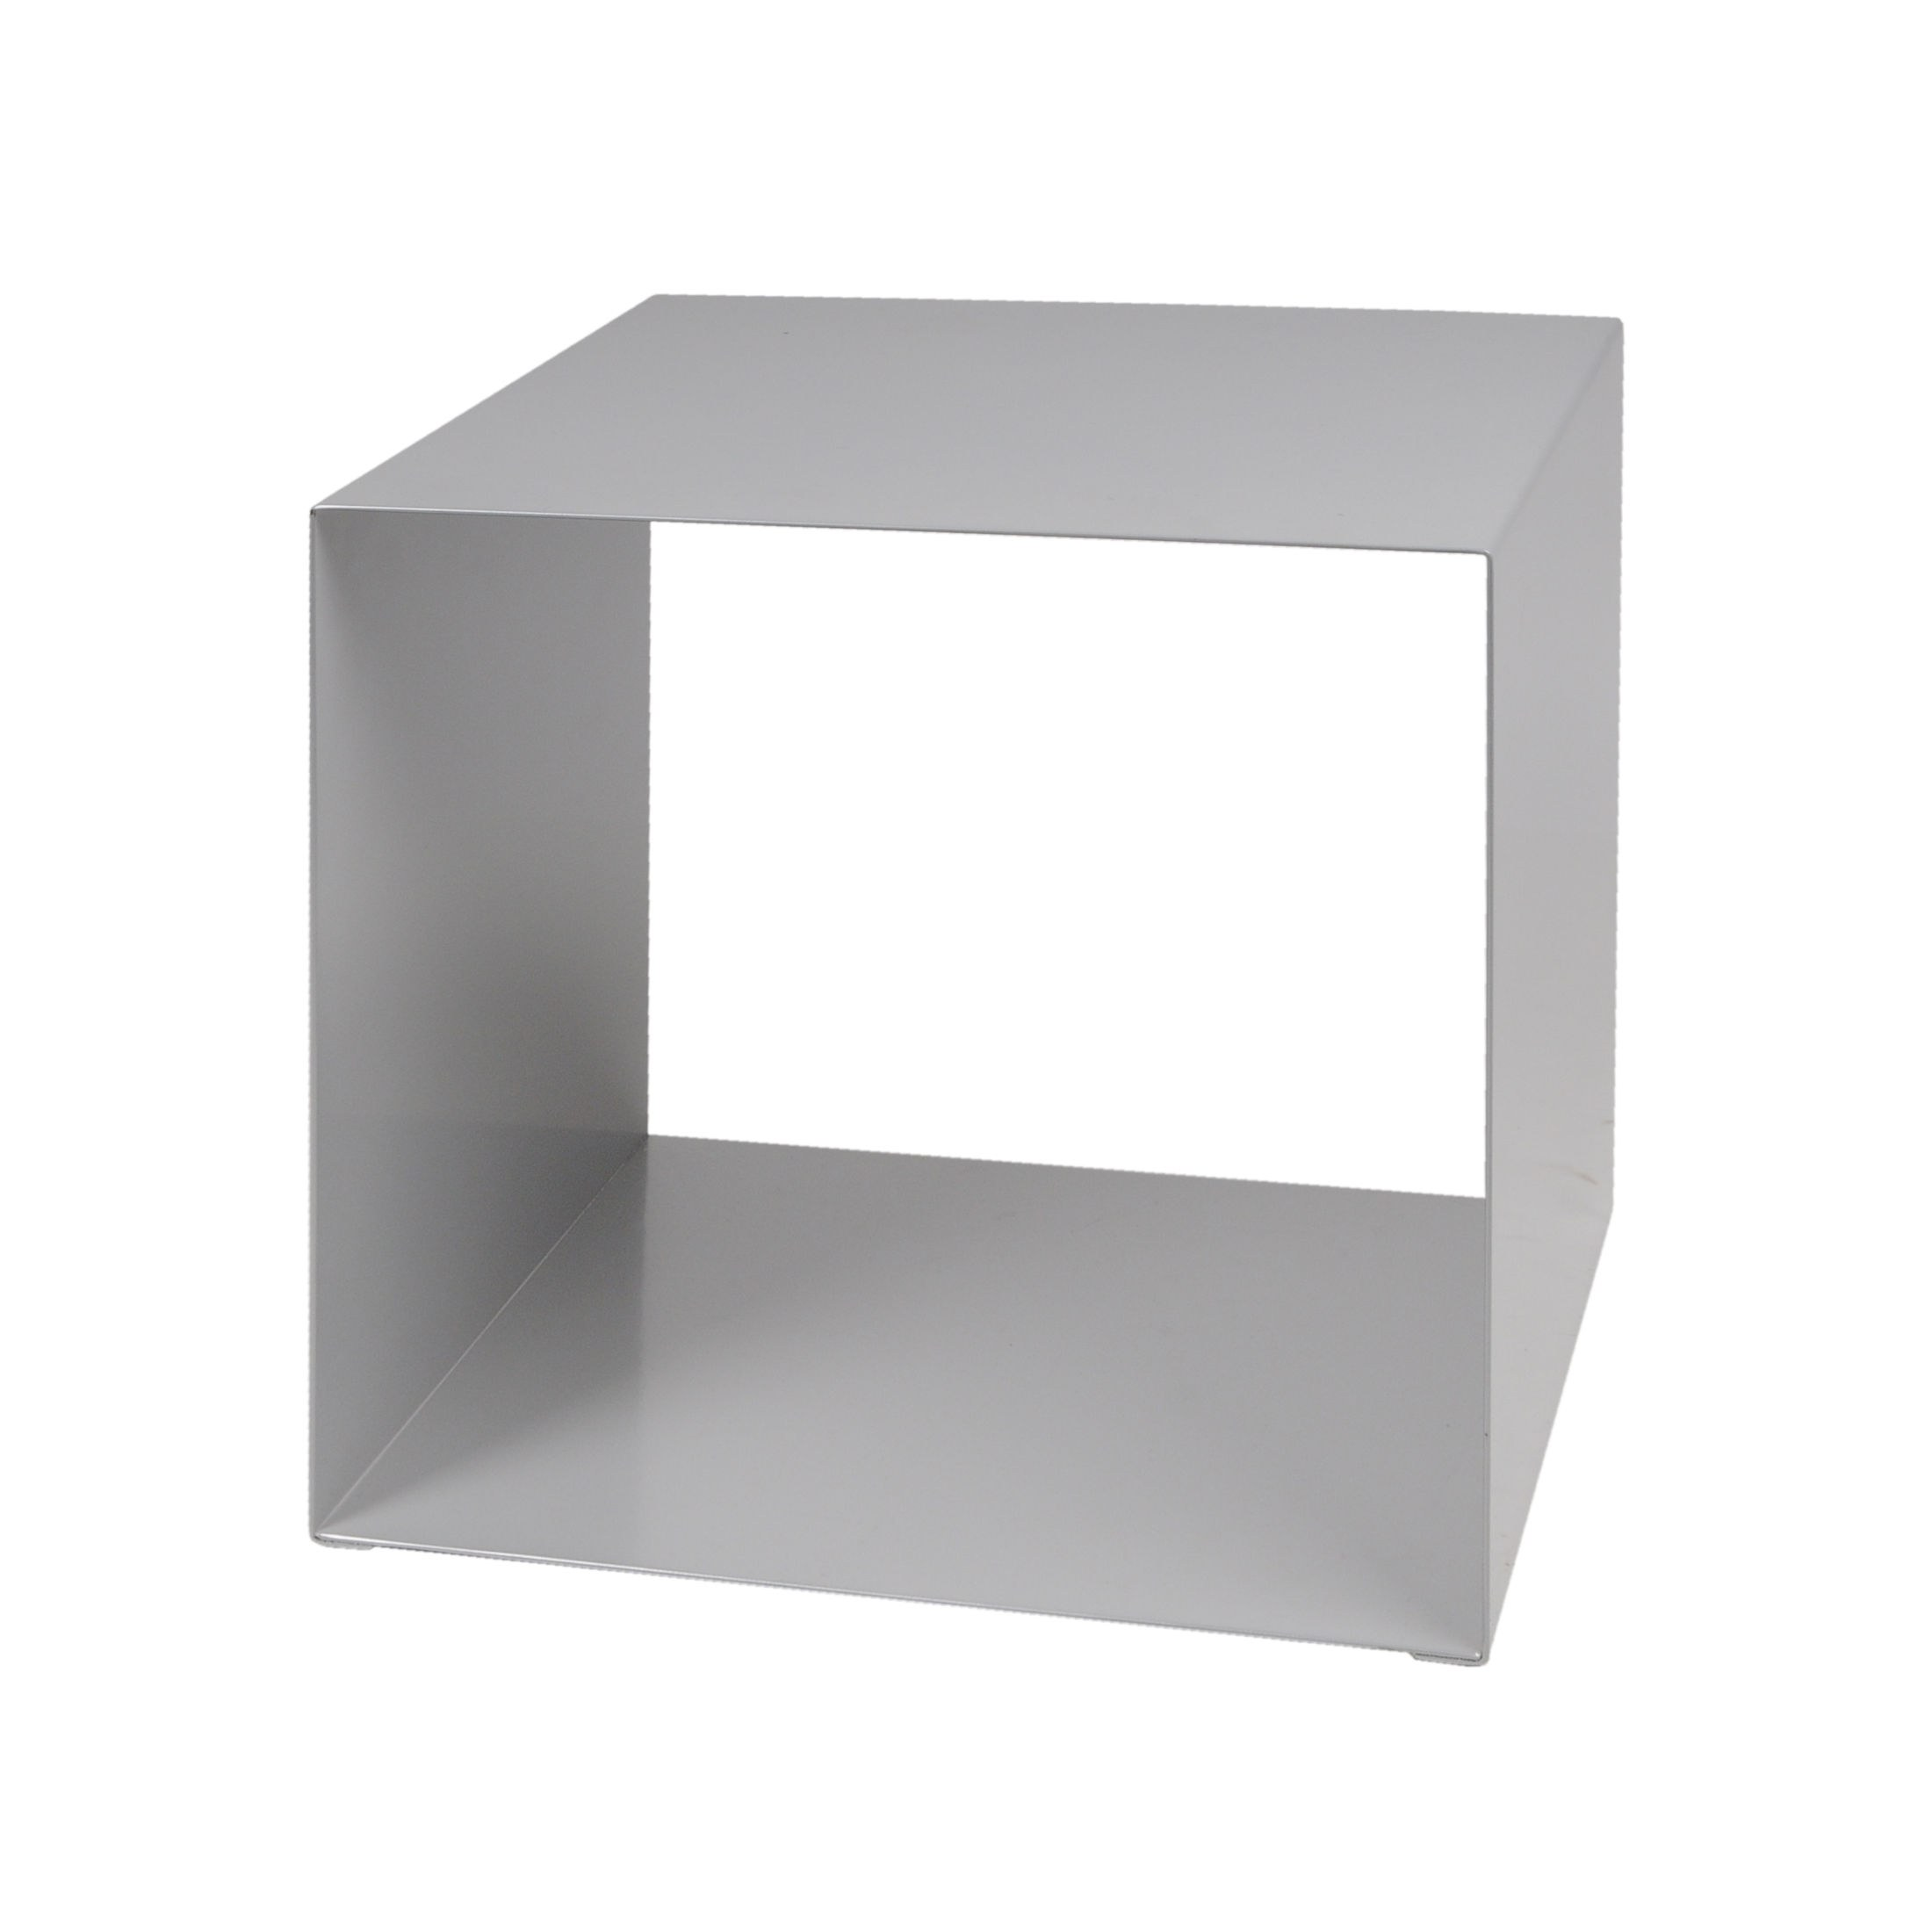 Full Size of Regalwürfel Metall Regal Wrfel Quadrato Silber Promondo Bett Weiß Regale Wohnzimmer Regalwürfel Metall